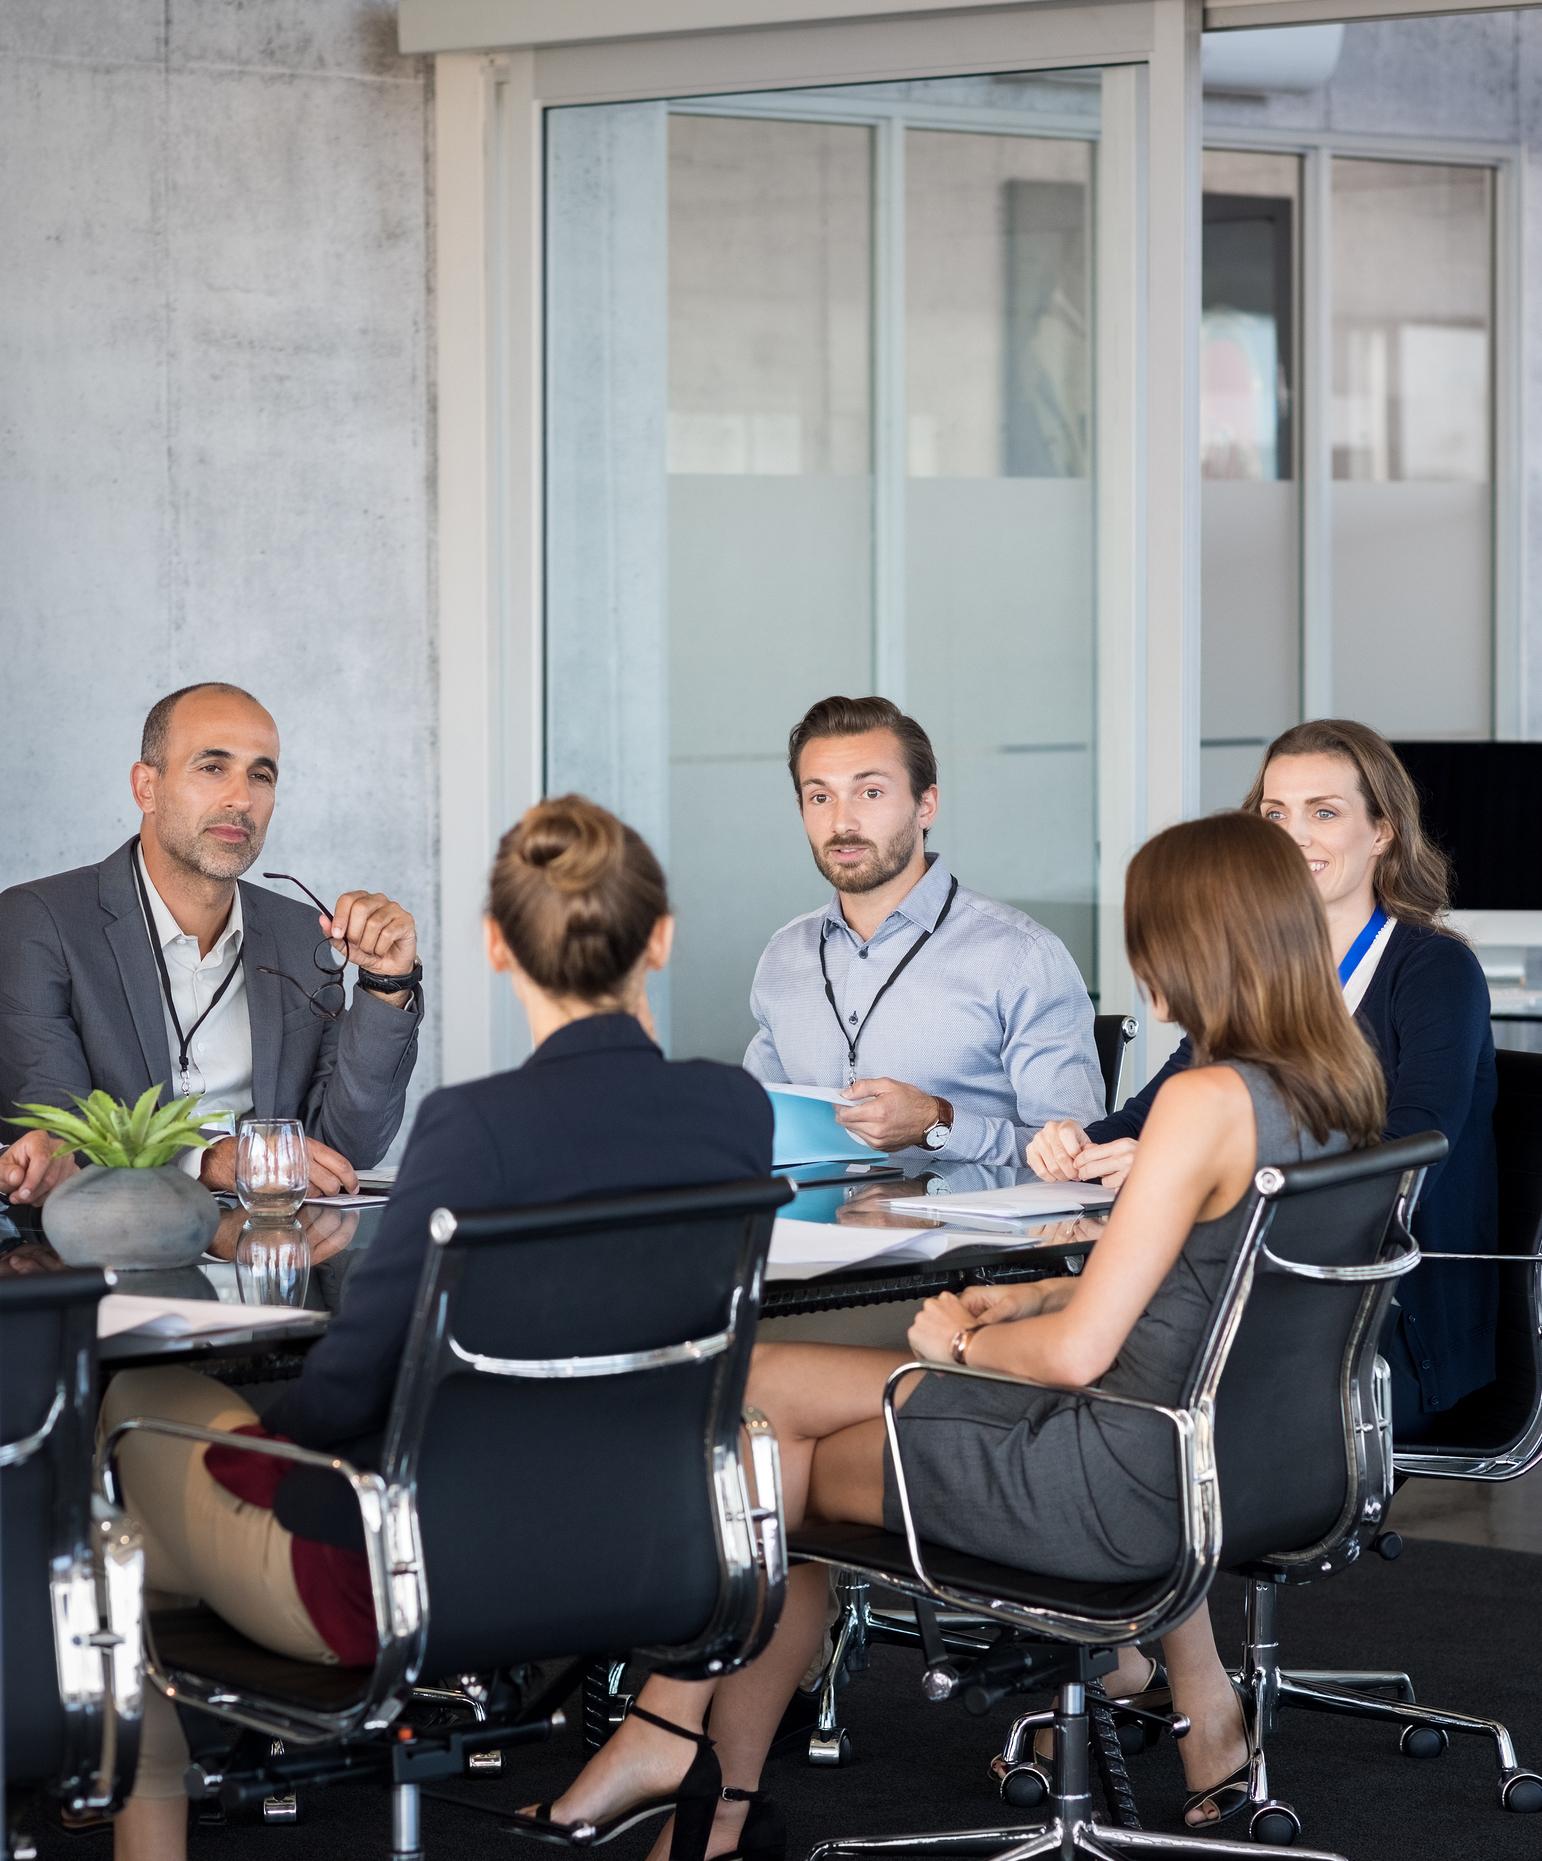 bigstock-Business-people-sitting-in-boa-206016238.jpg